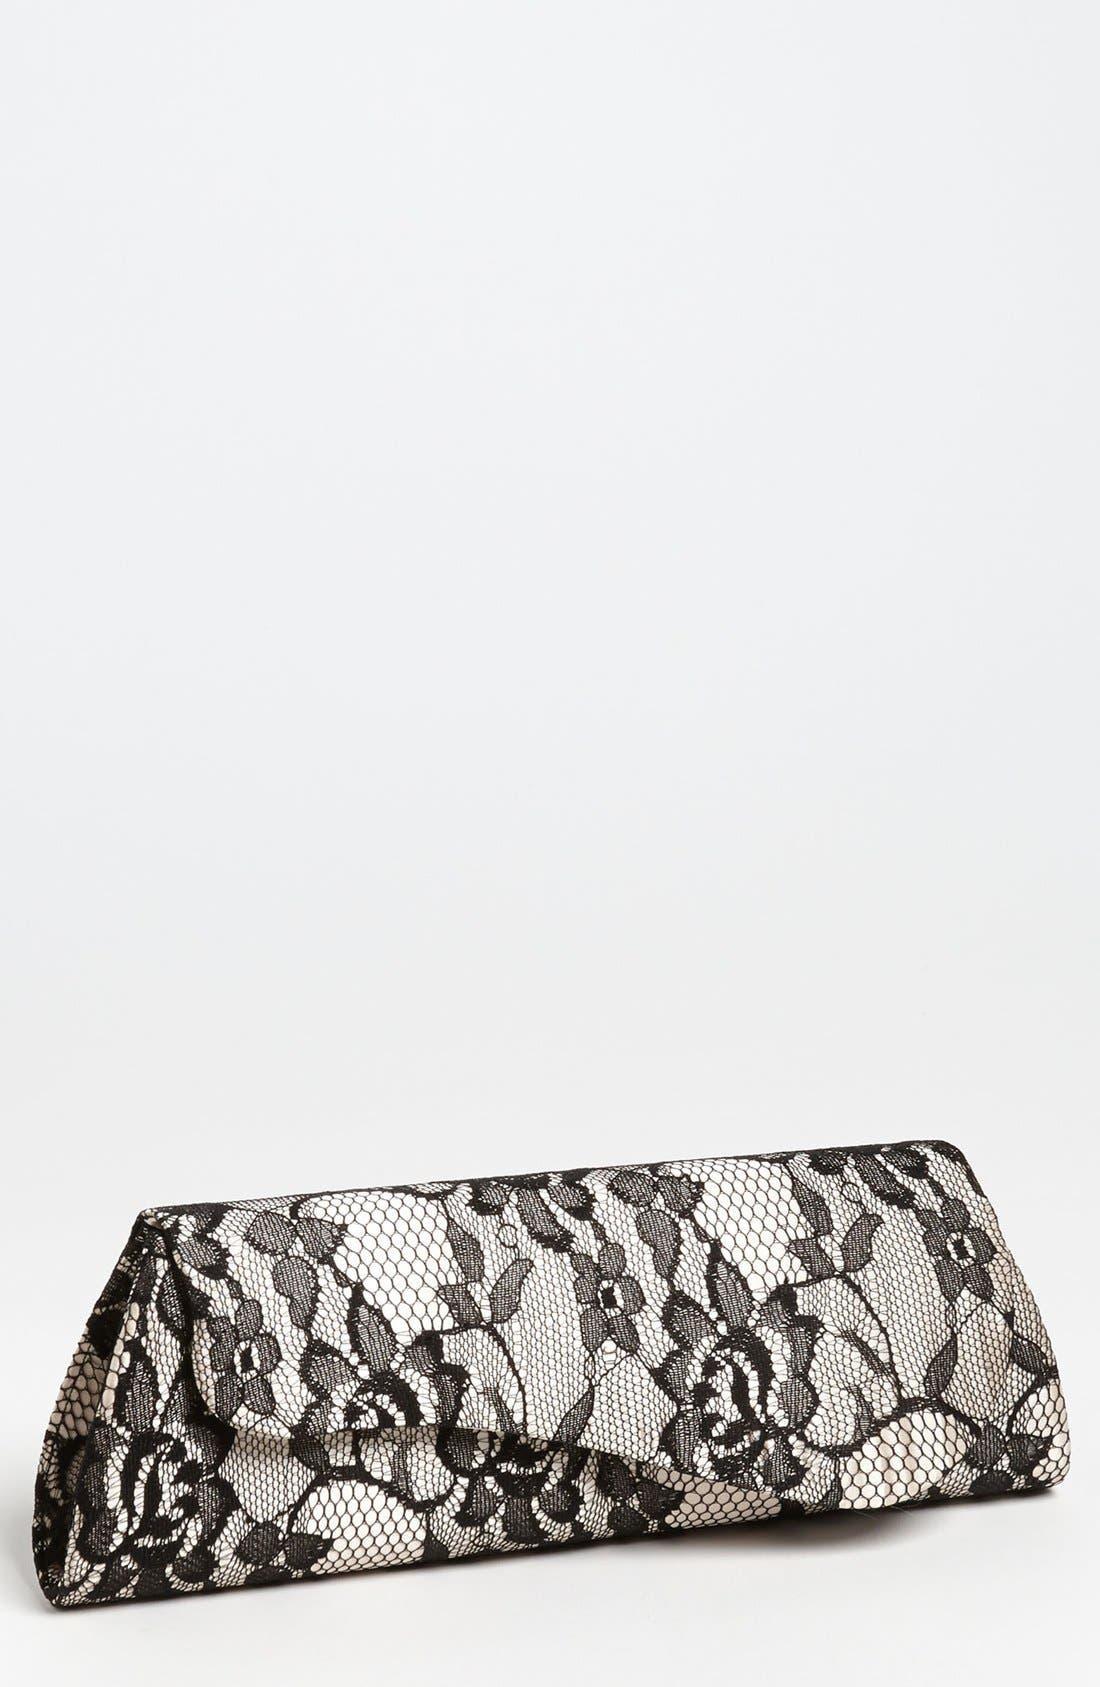 Alternate Image 1 Selected - Jessica McClintock Lace Envelope Clutch